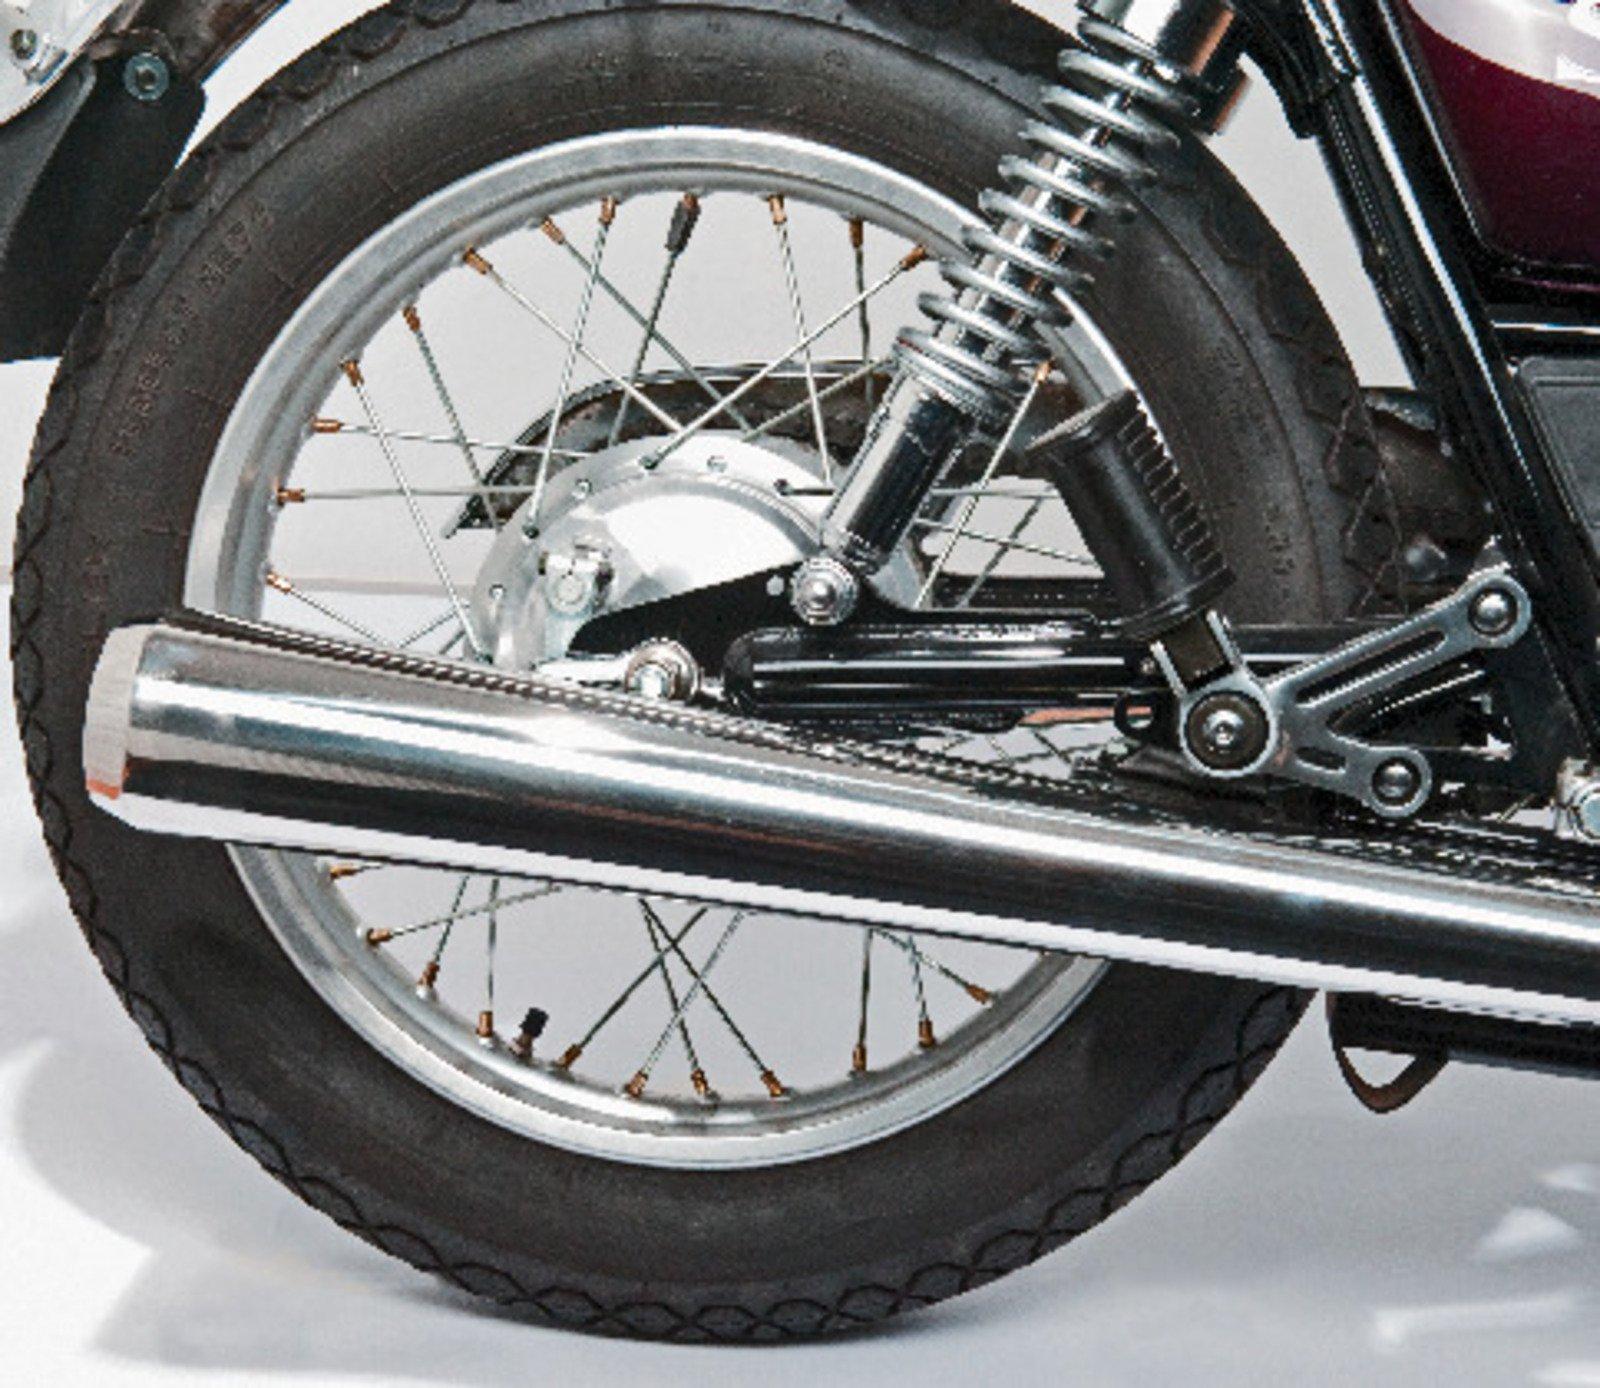 Yamaha SR500 Stainless Steel Silencer (shape similar to OEM without expansion tank) 29206